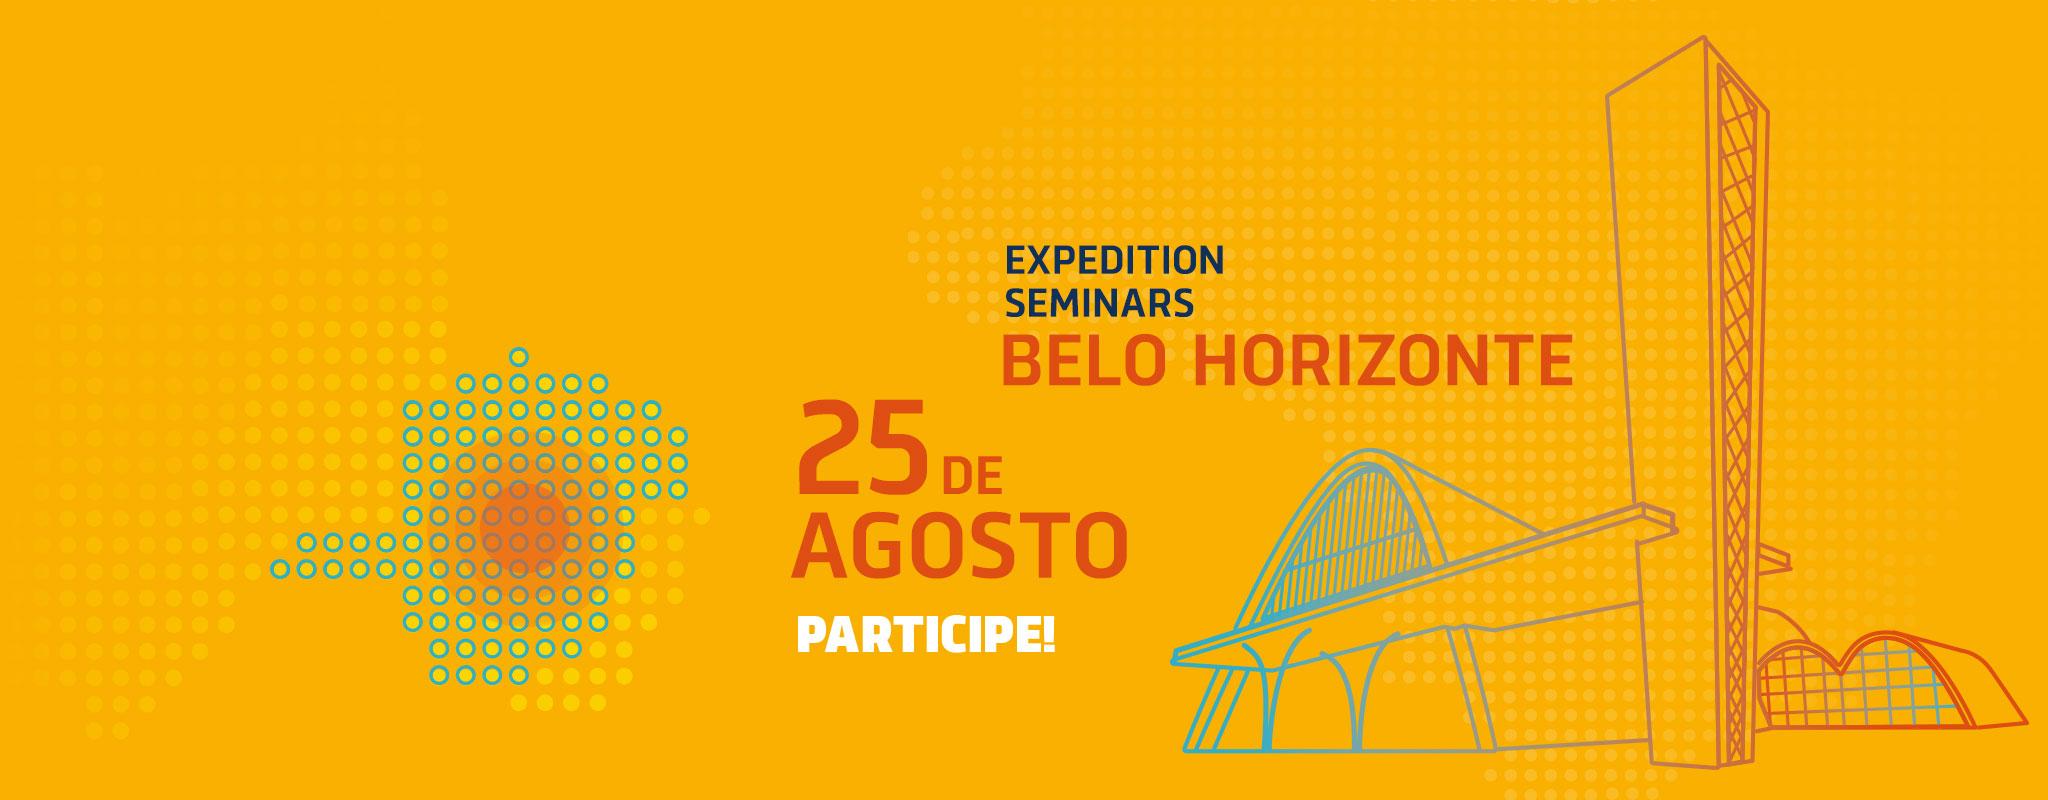 Dia D - Drogavet / Expedition Seminars - Belo Horizonte